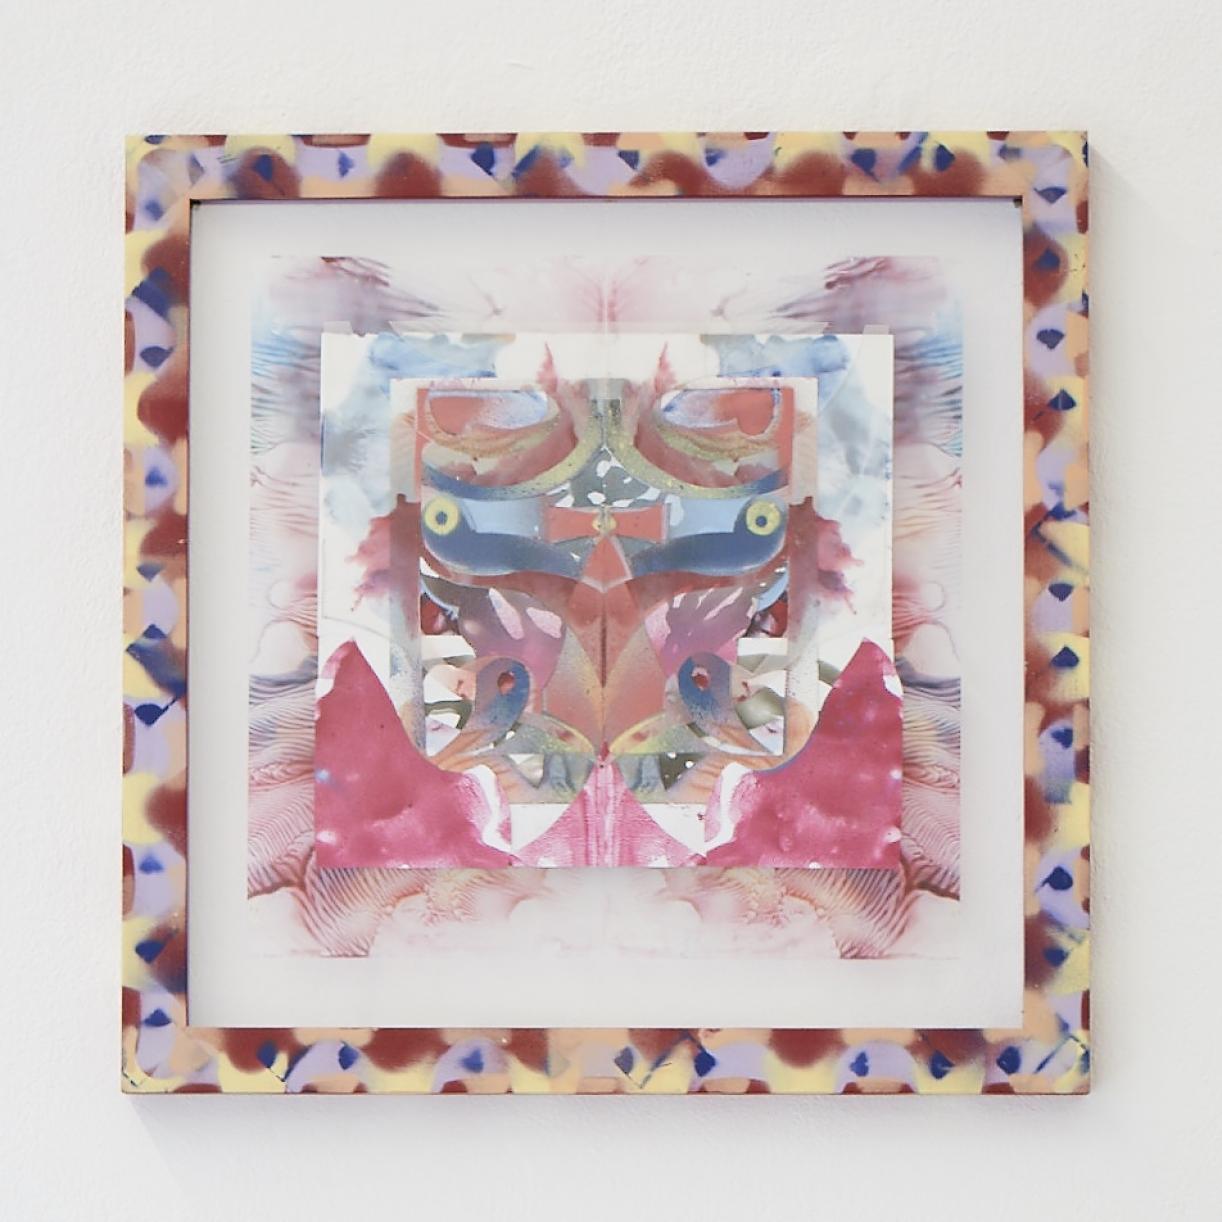 Moritz Altmann, eko, 2017, mixed media on paper and transparency, sprayed frame, 40,5 x 40,5 cm